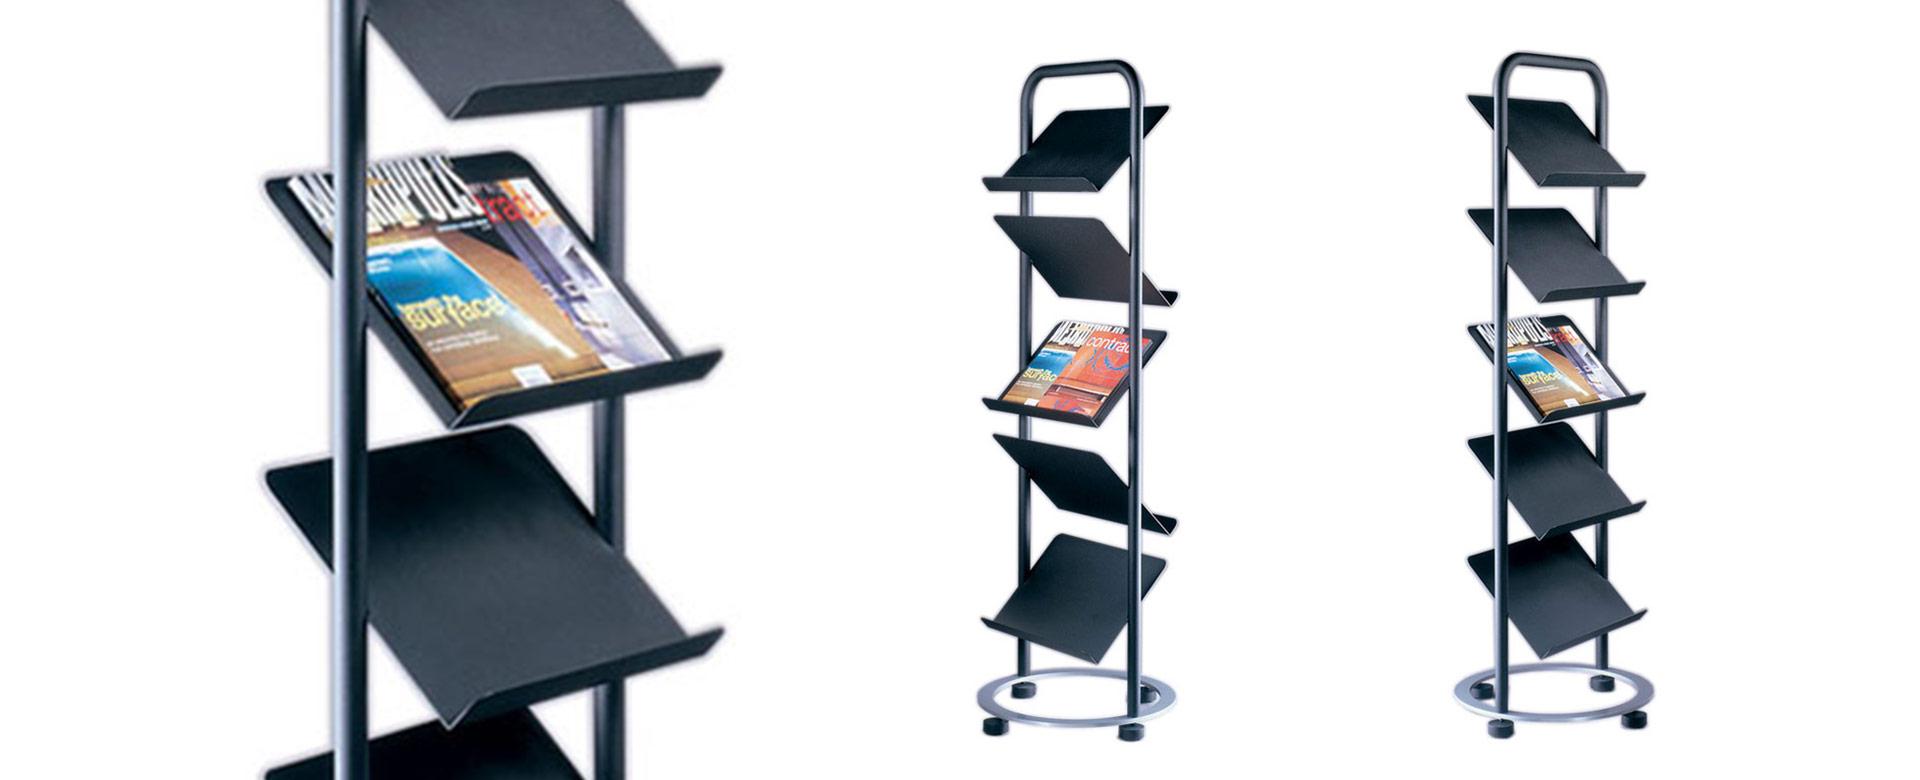 Exhibition Stand Revit : Spring magazine racks